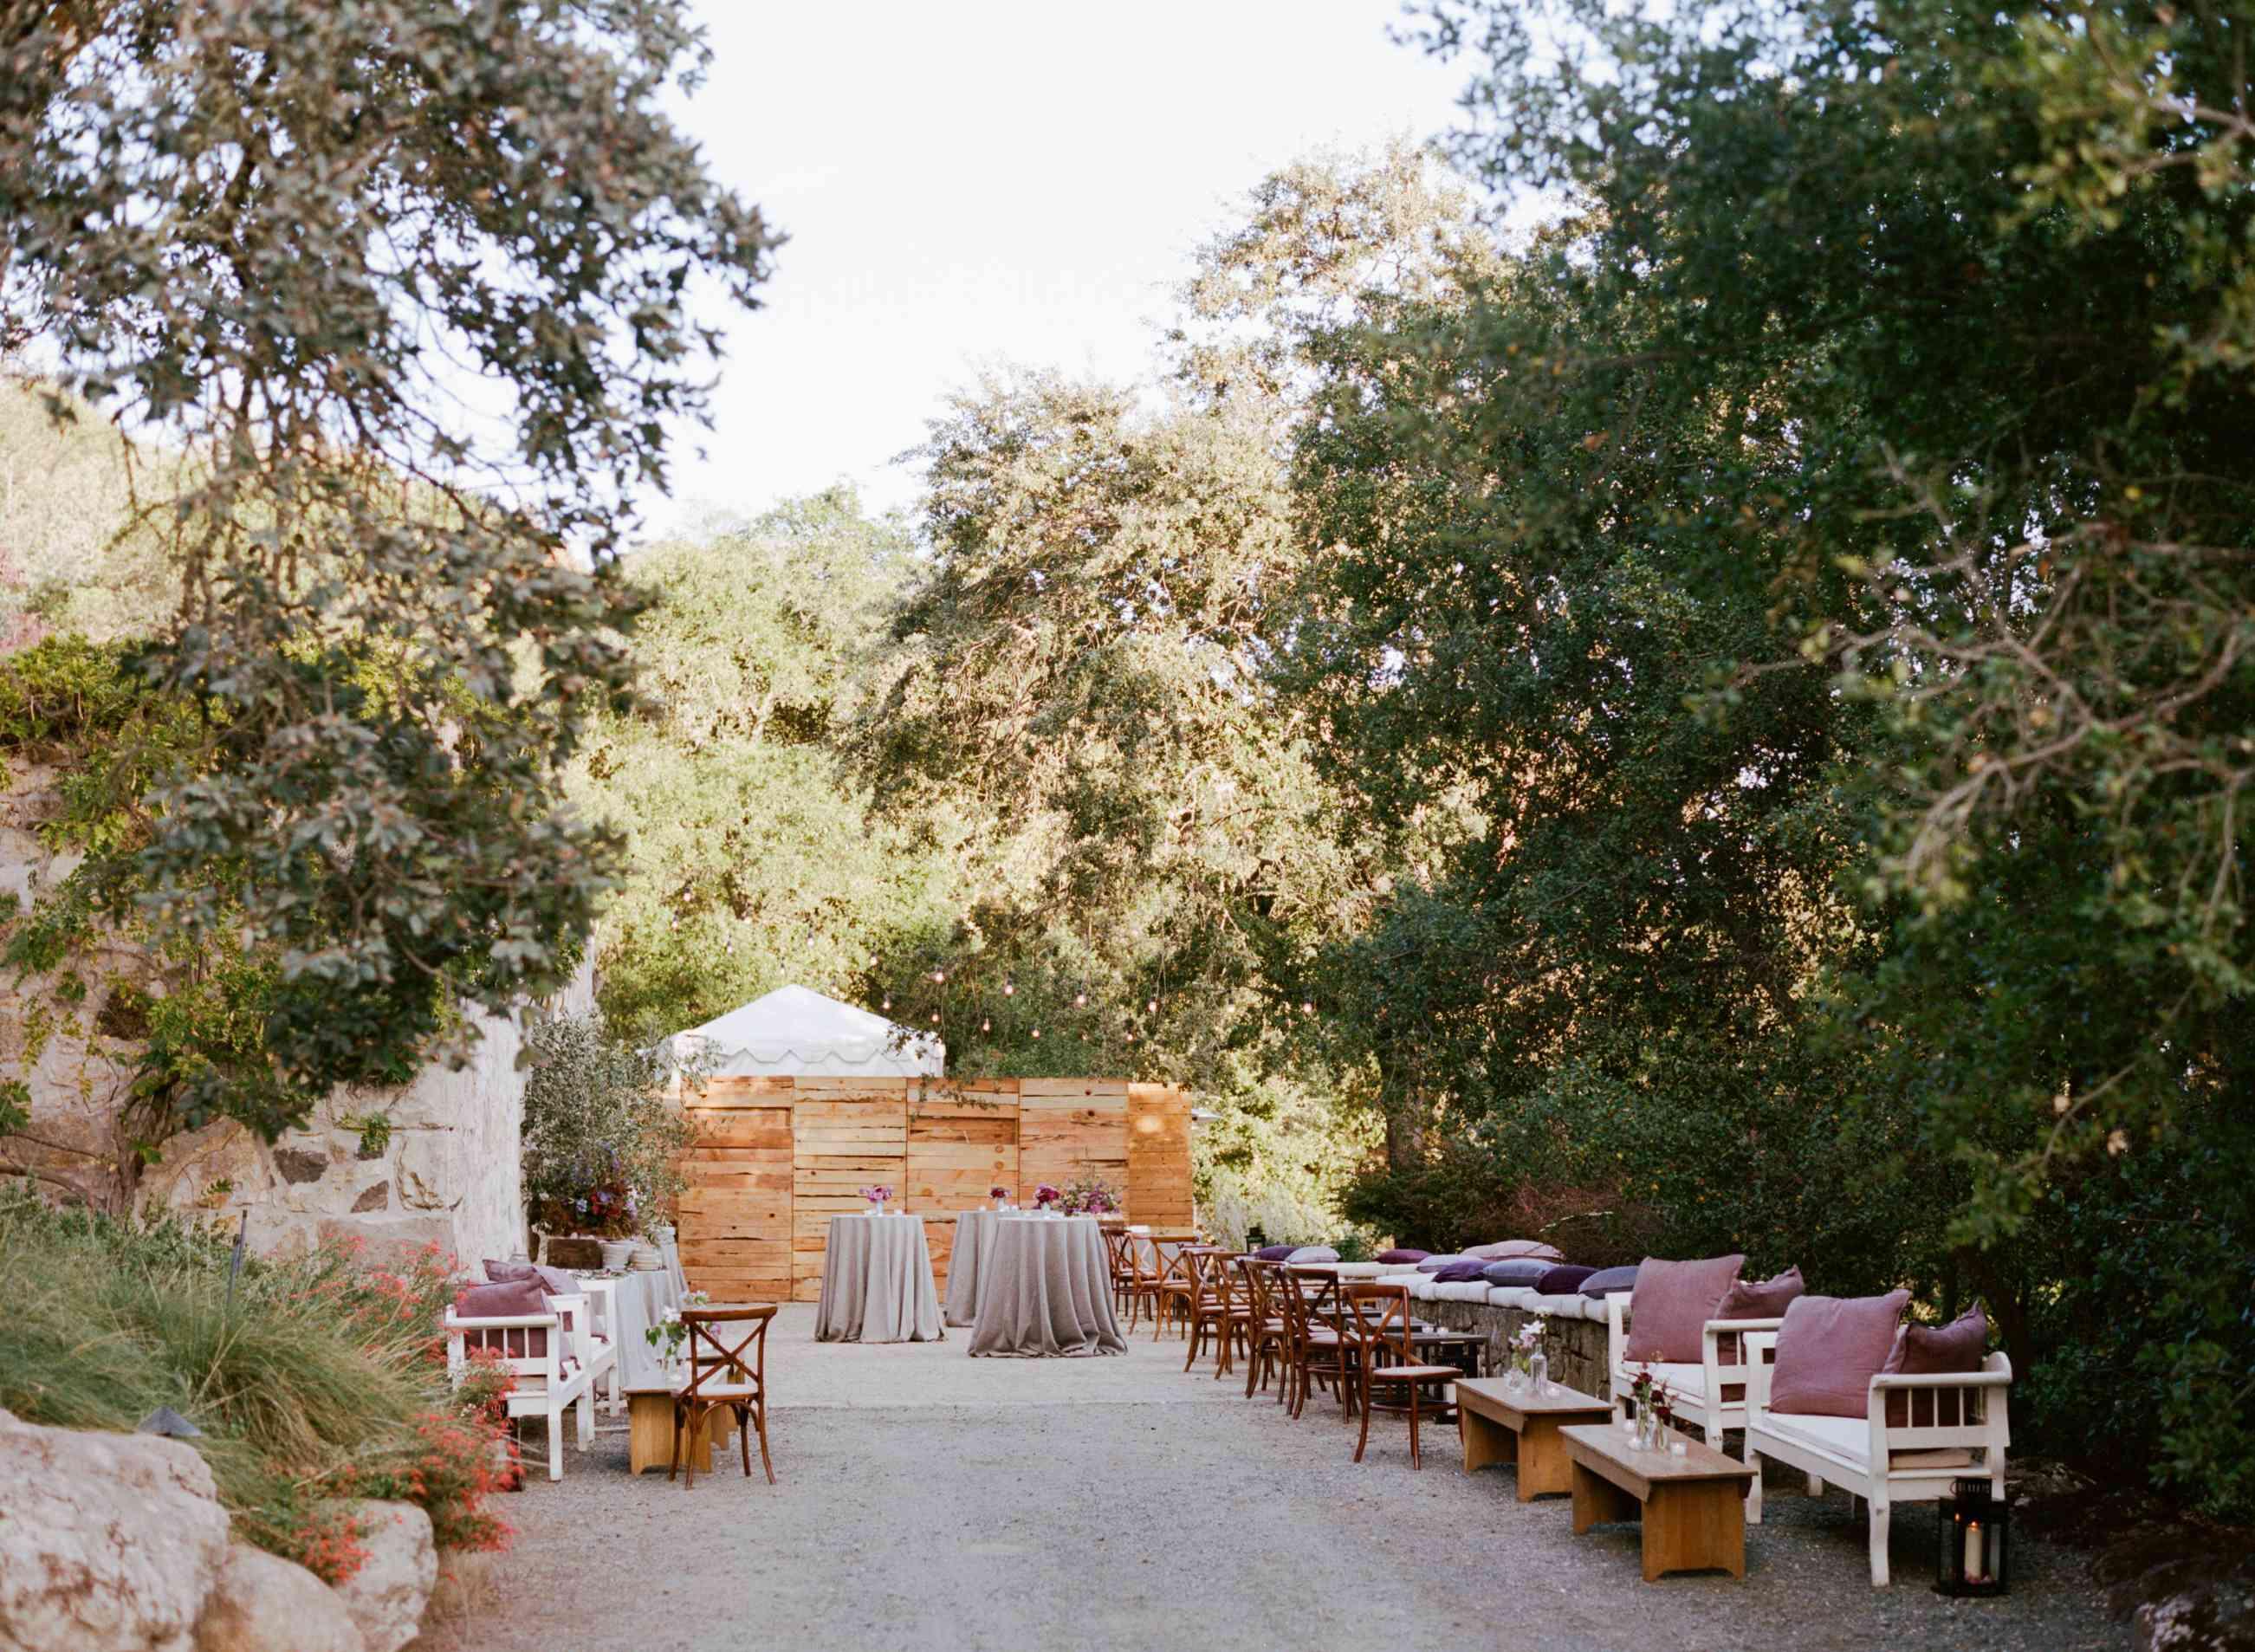 <p>Lounge area amongst trees and foliage.</p>